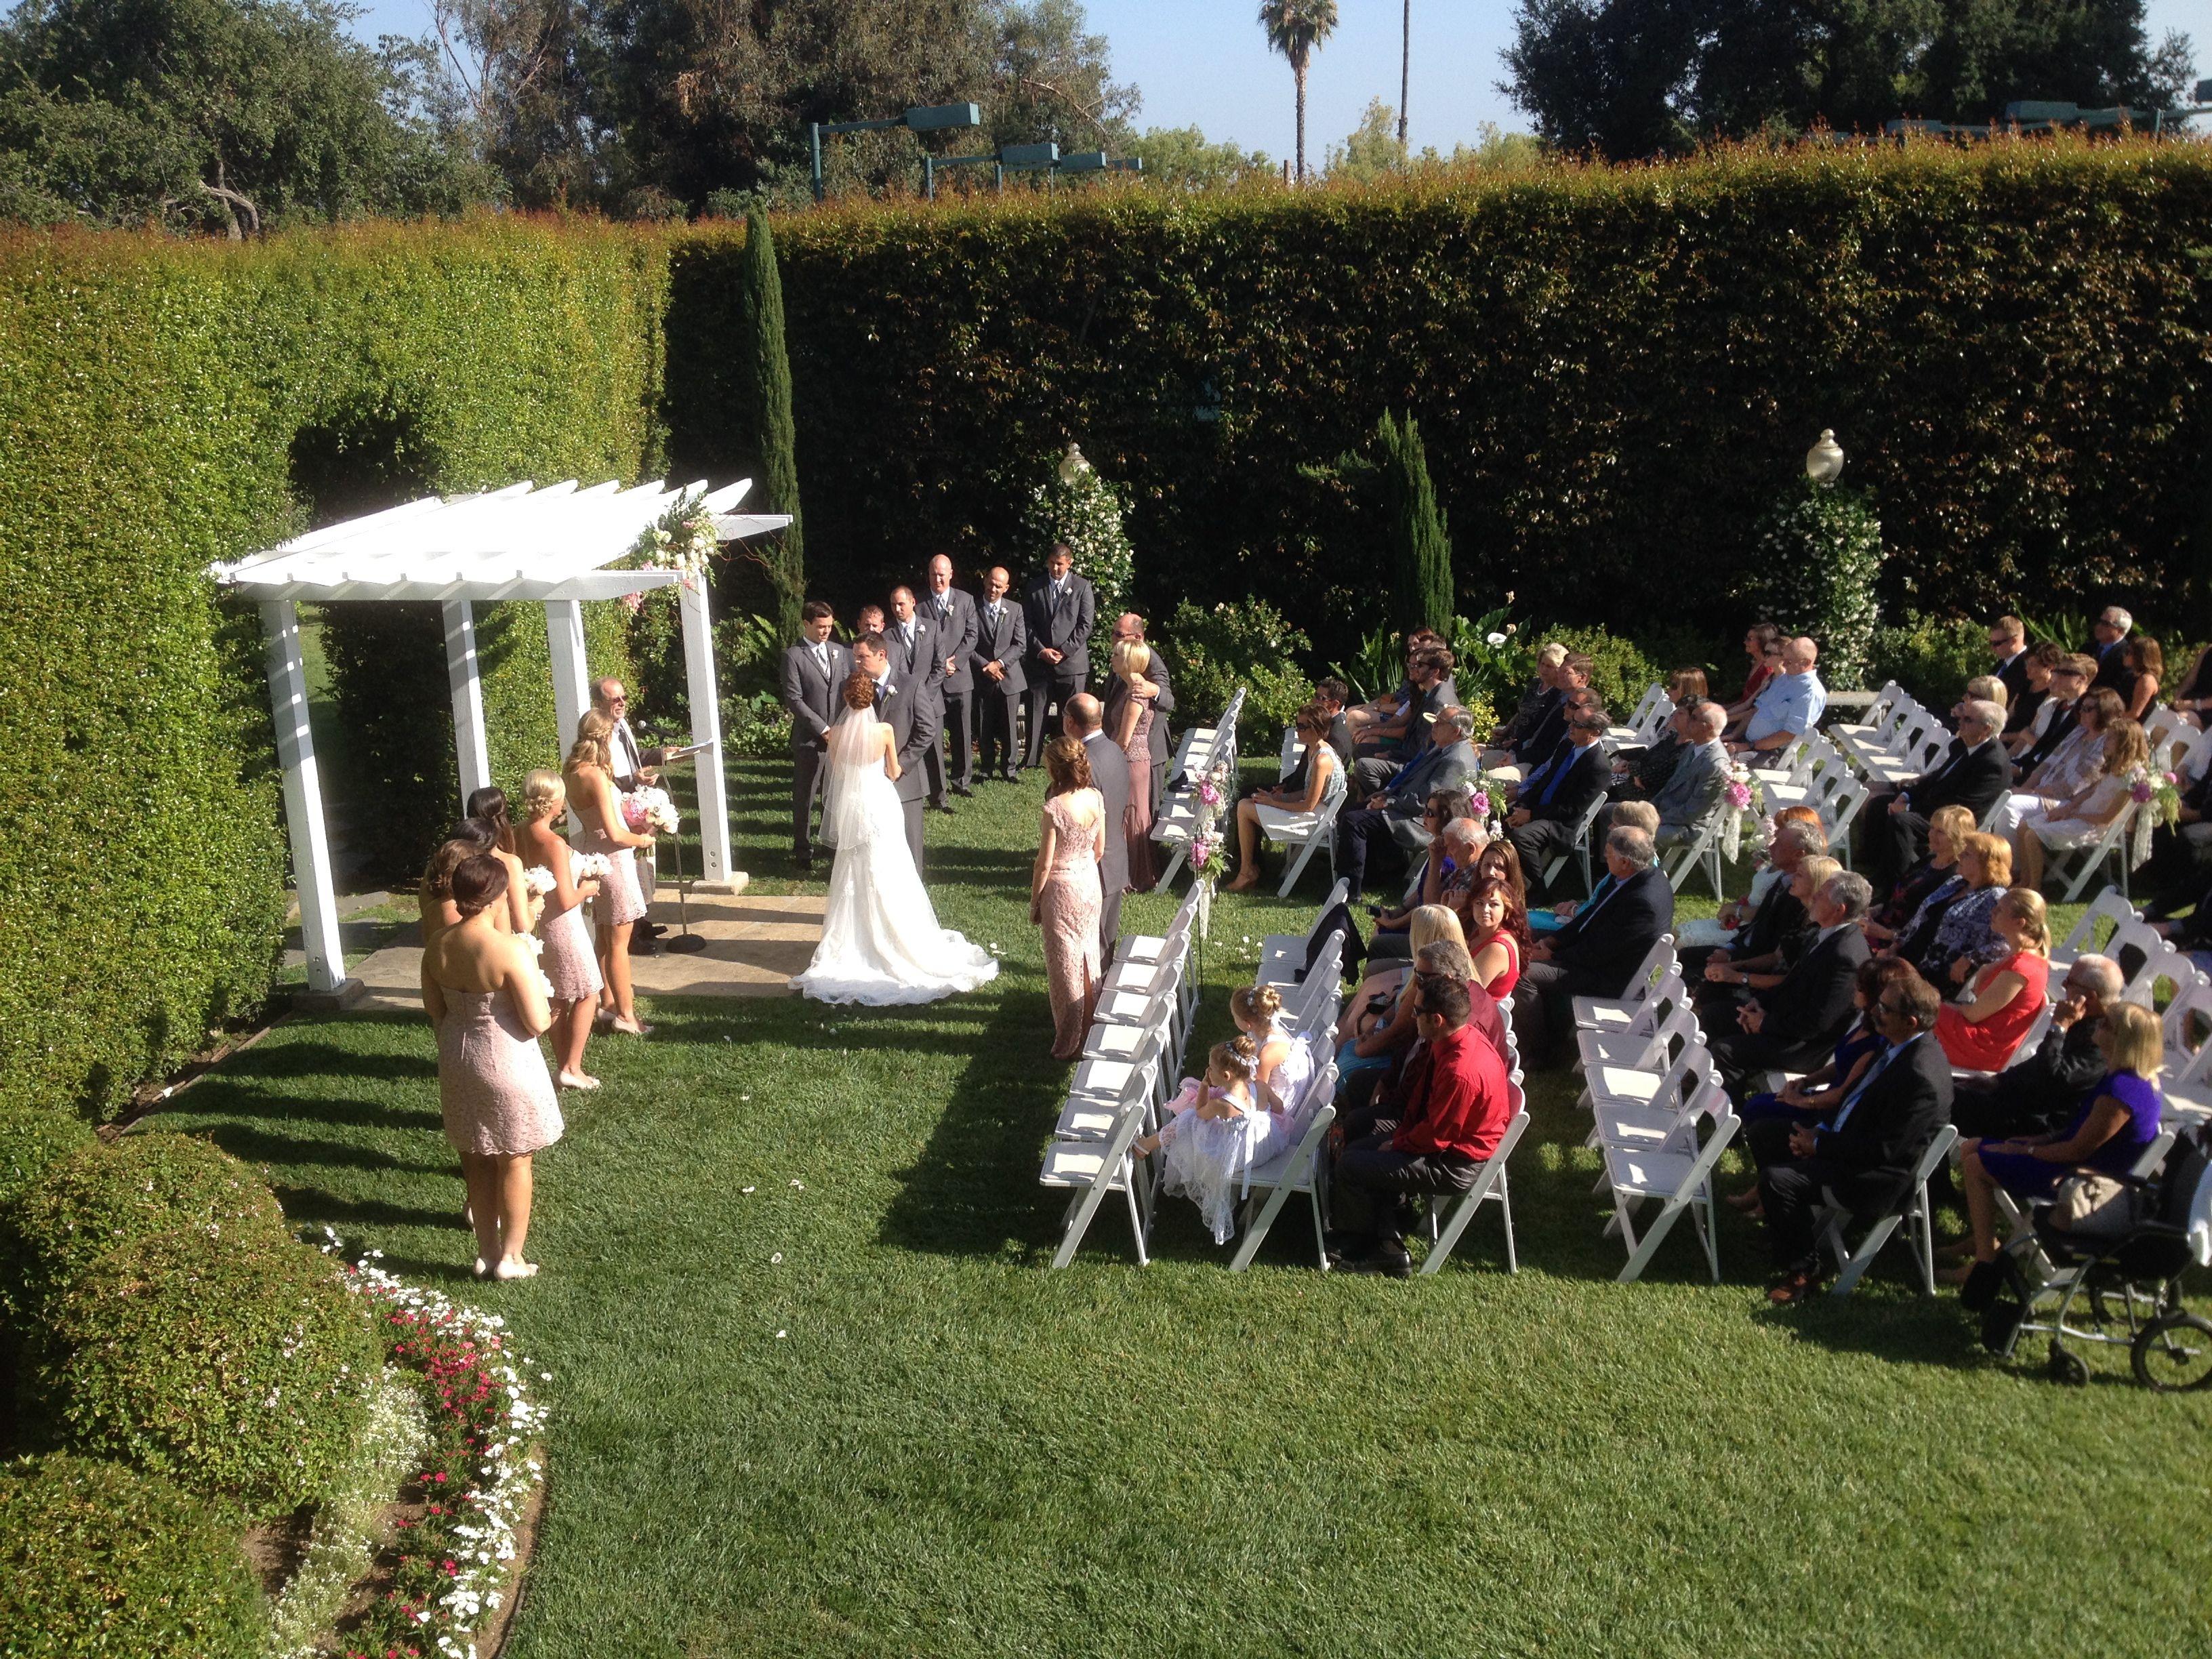 Altadena Wedding Ceremony Picture From The Balcony